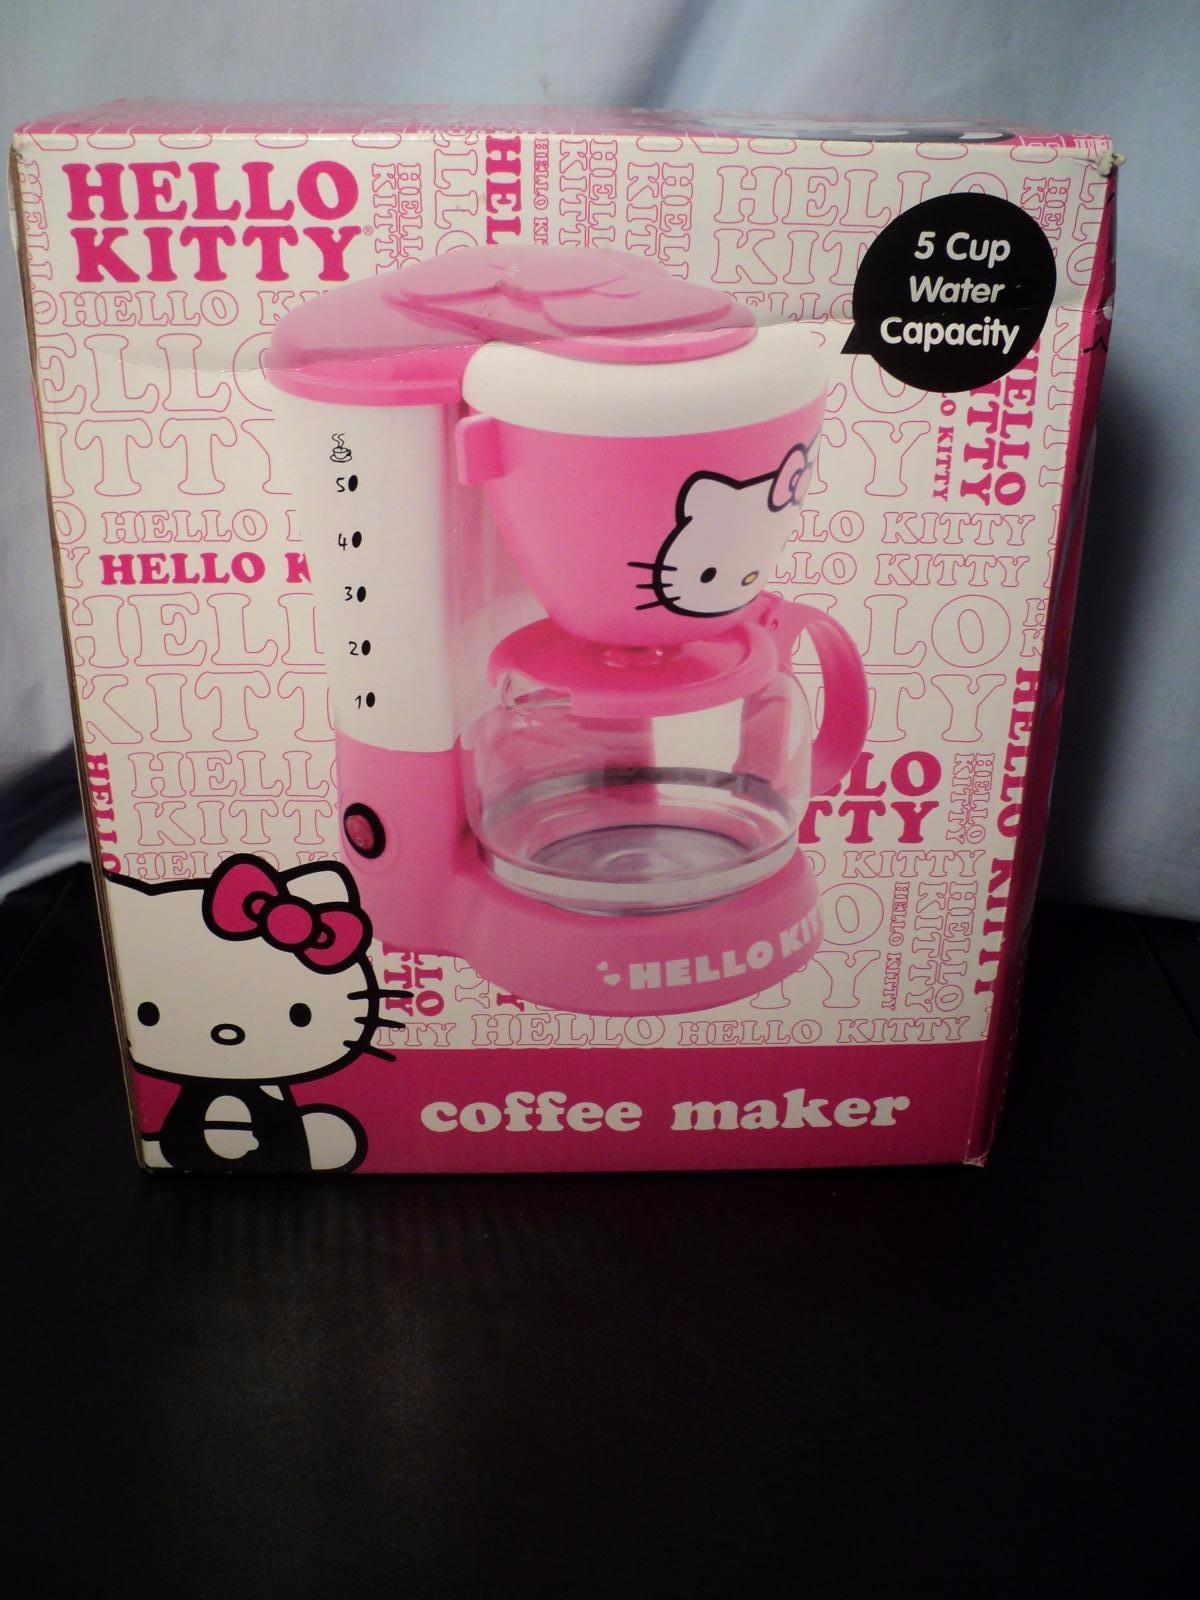 HELLO KITTY APP-36209 KITCHEN APPLIANCE ELECTRIC COFFEE MAKER MACHINE PINK NEW eBay